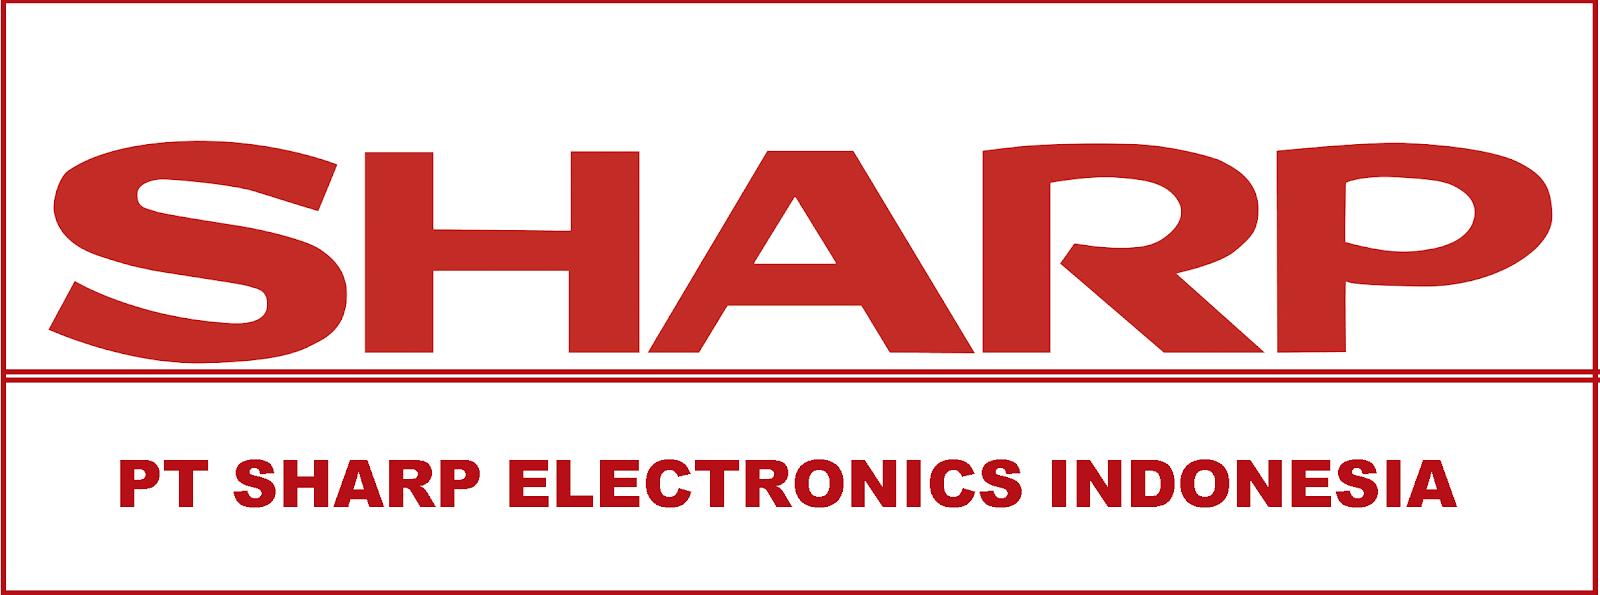 Lowongan Kerja PT Sharp Electronics Indonesia Terbaru November 2018